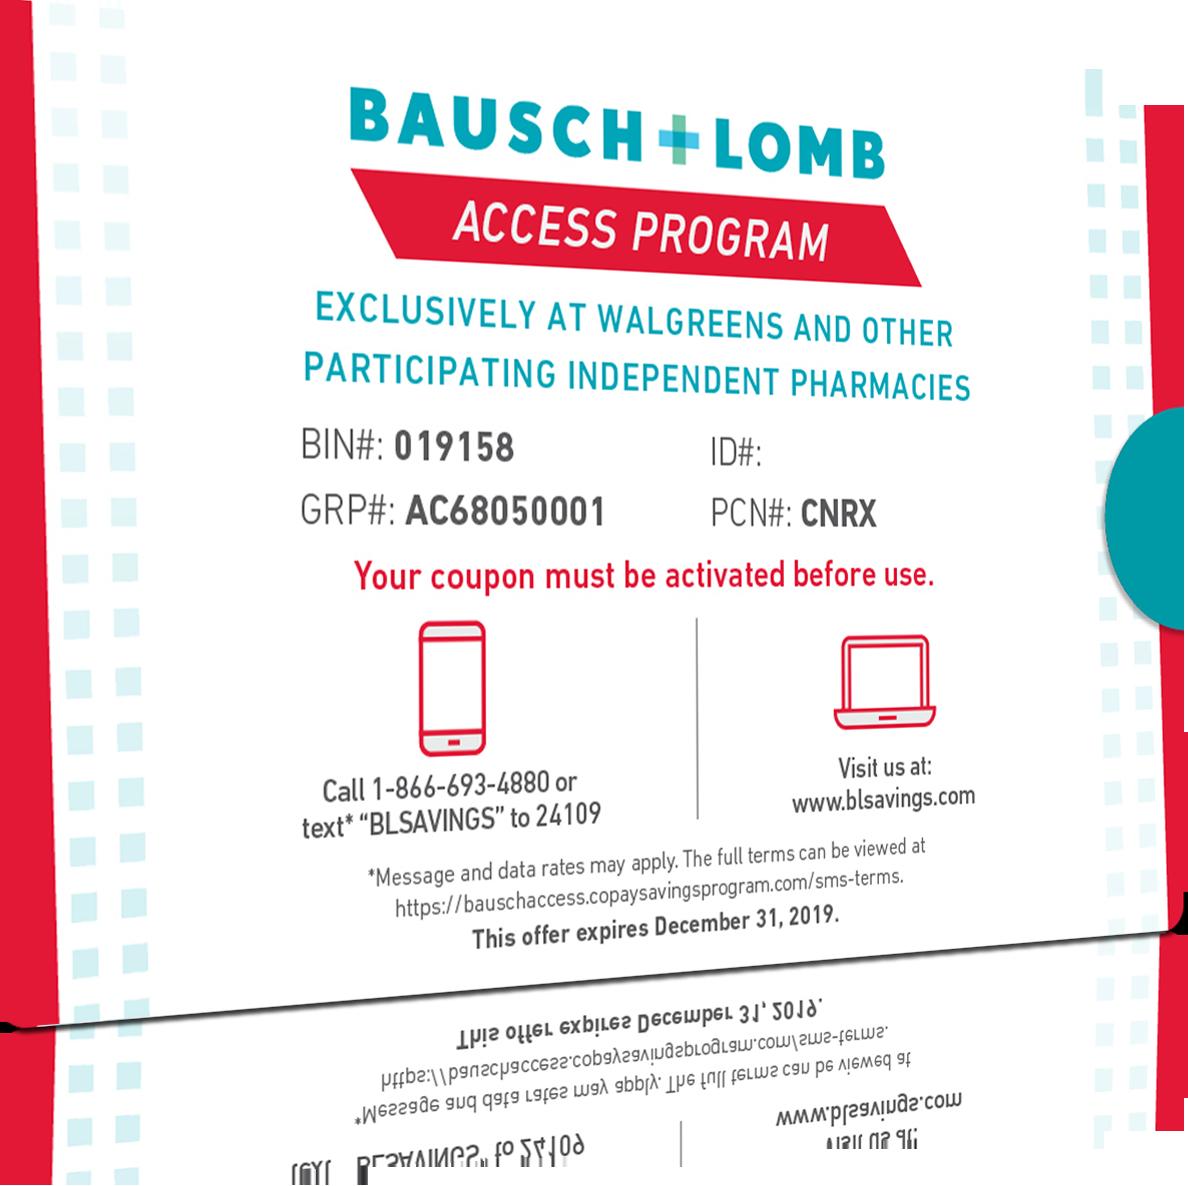 Bausch Lomb Access Program Health Insurance Plans Health Care